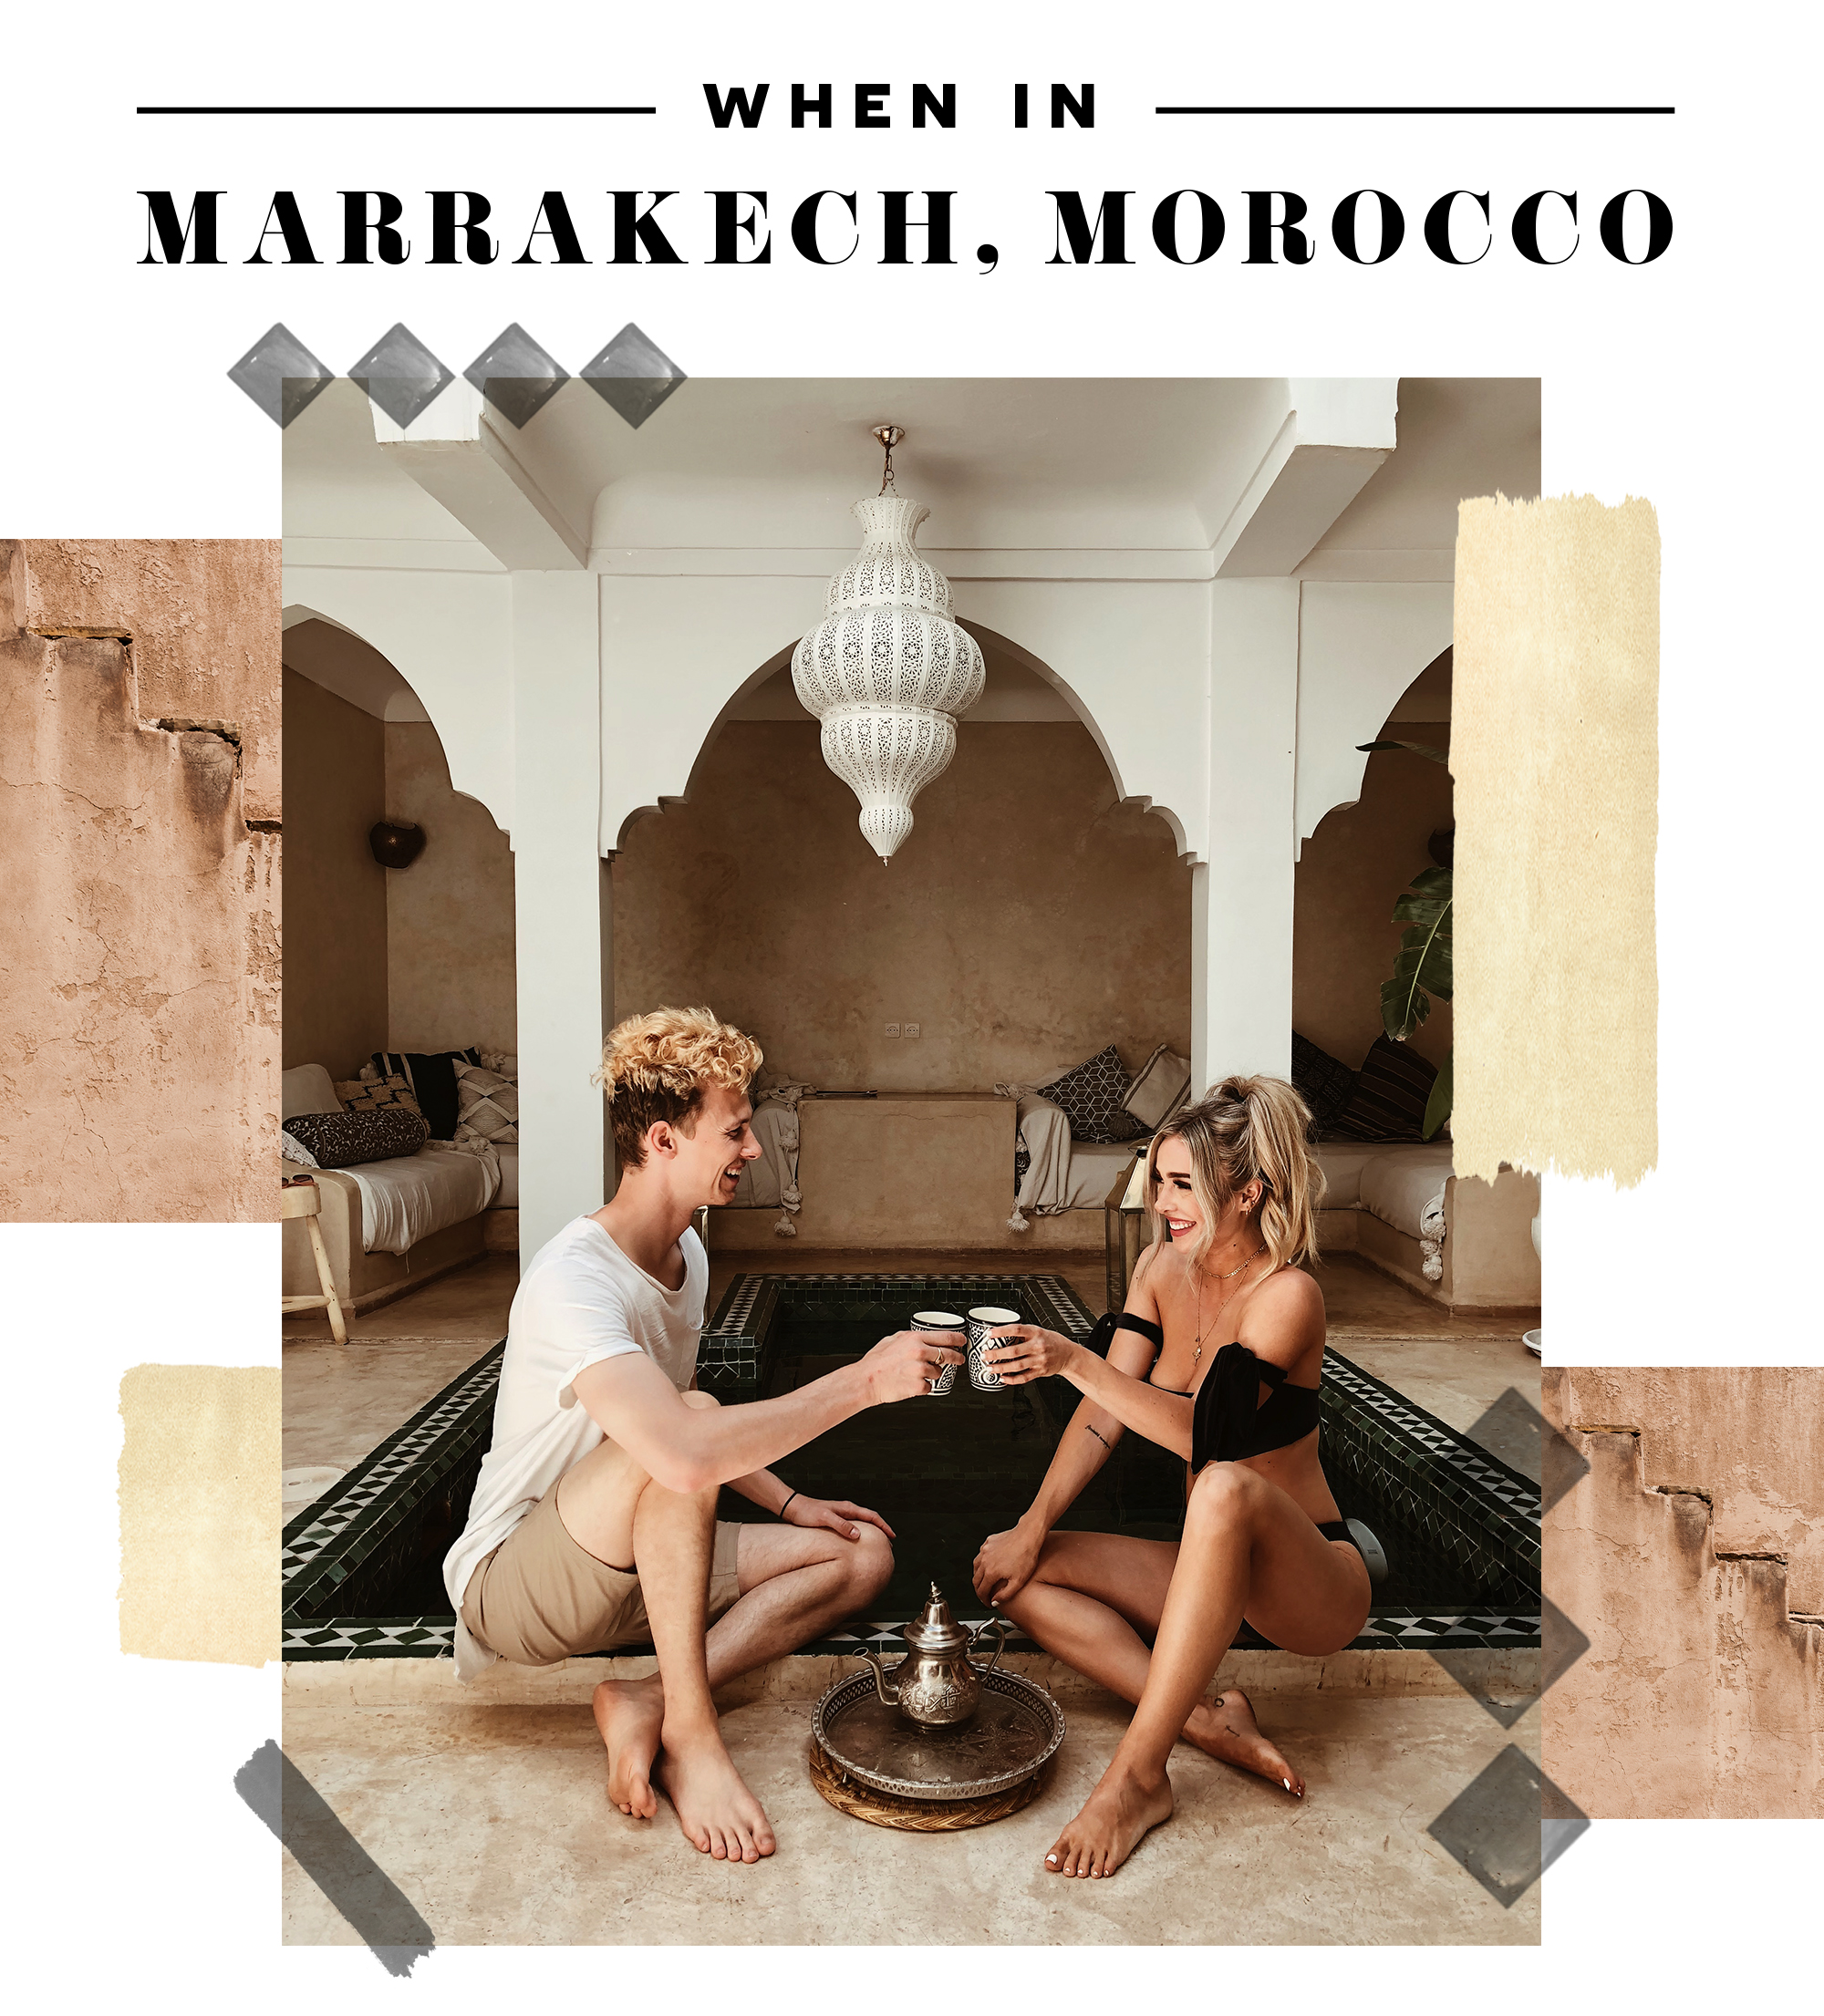 "@thestyleseed and her boyfriend in Marrakech, Morocco. Photo is titled, ""When in Marrakech, Morocco""."